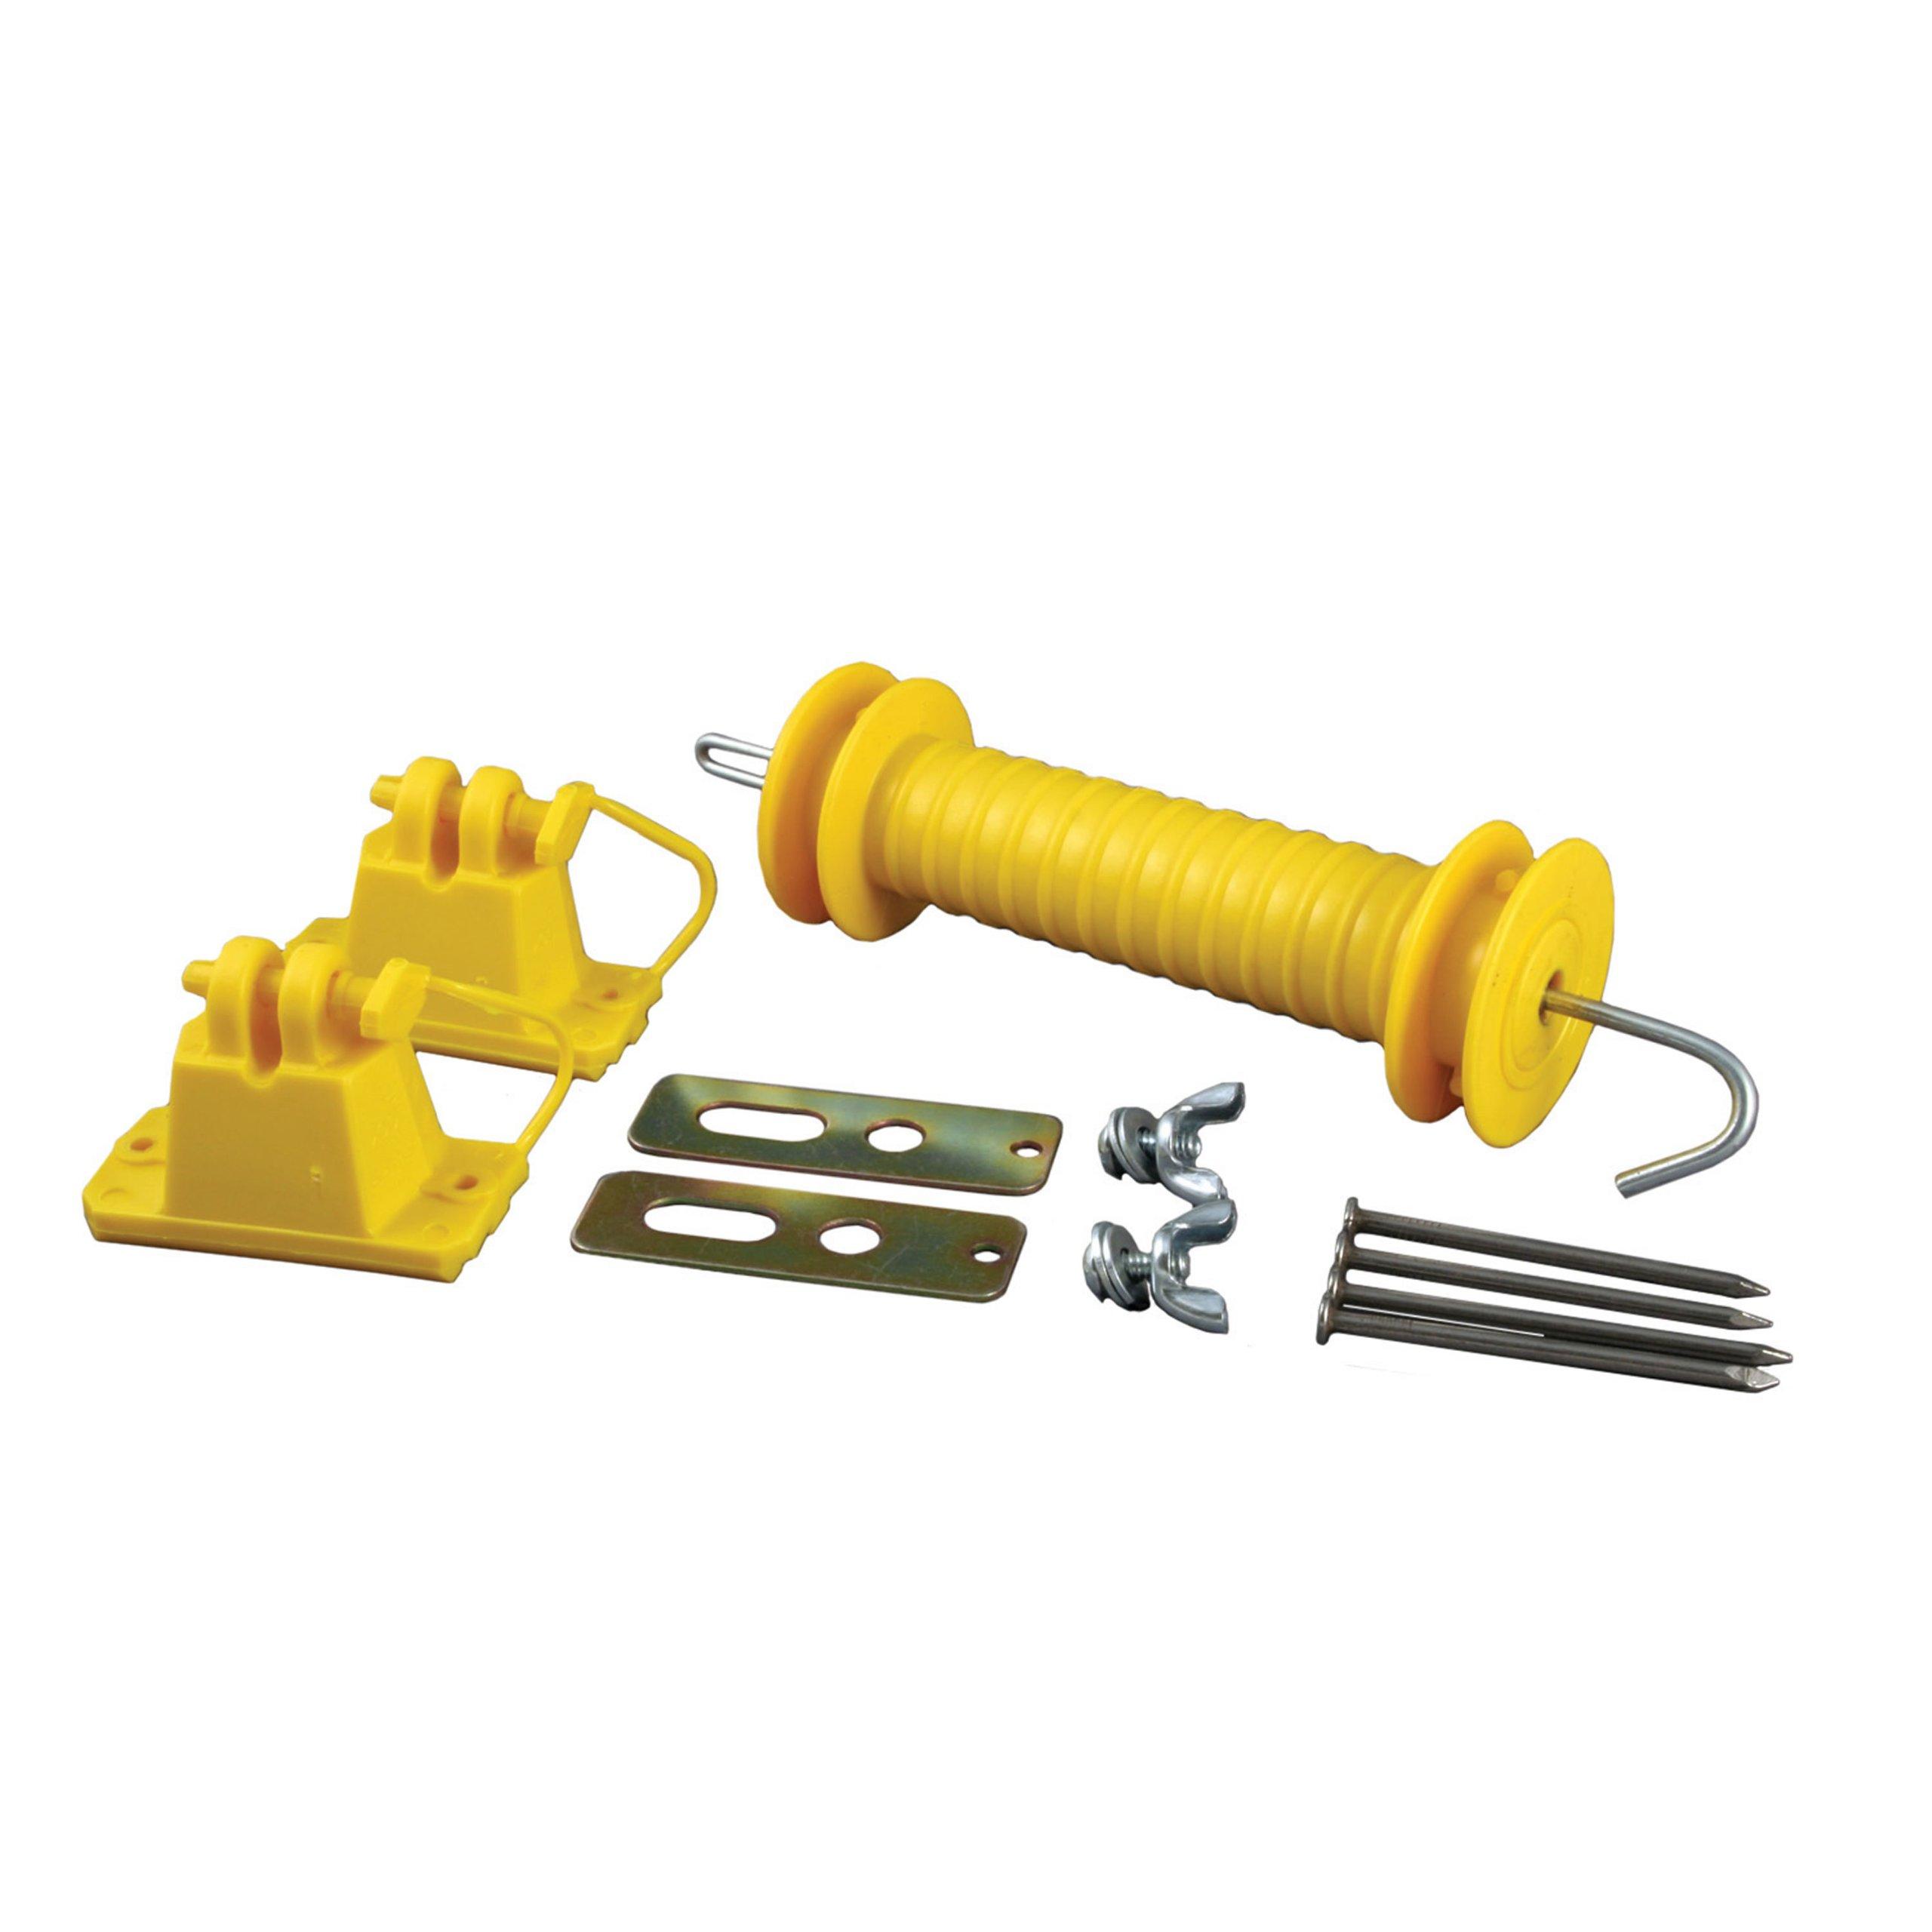 Zareba YWPGK10 Wood Post Gate Kit, Yellow